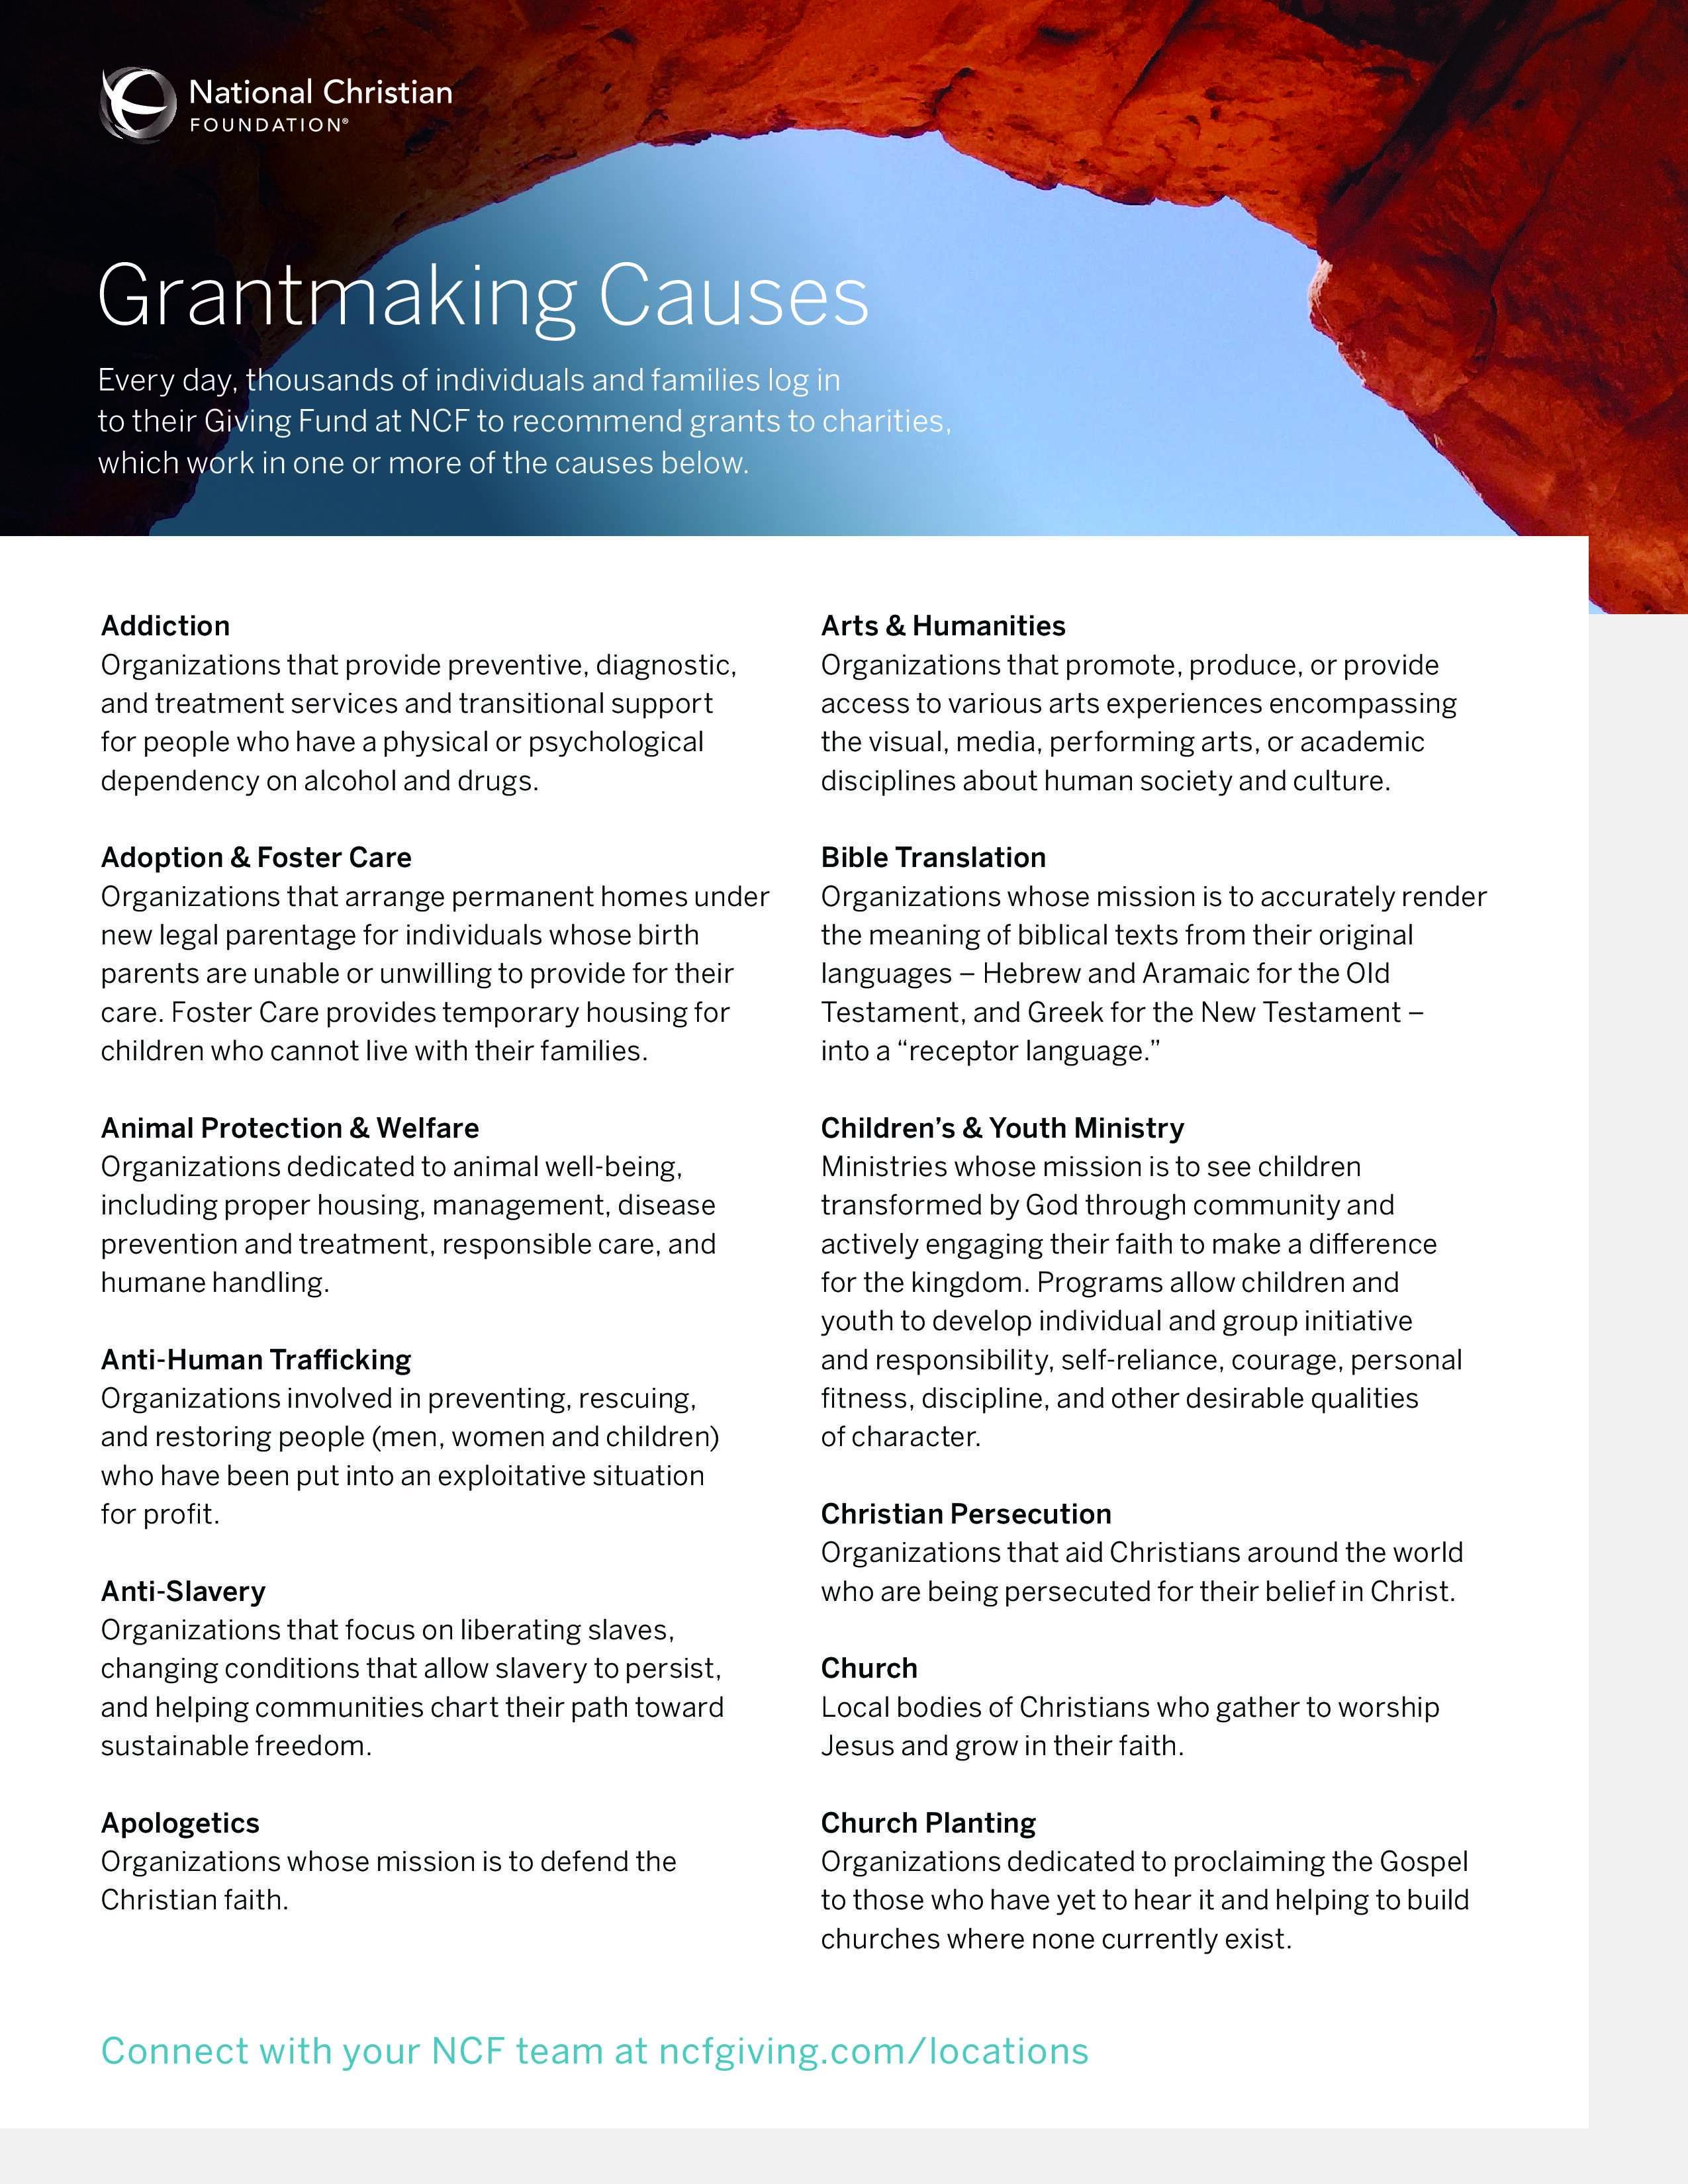 Grantmaking Causes